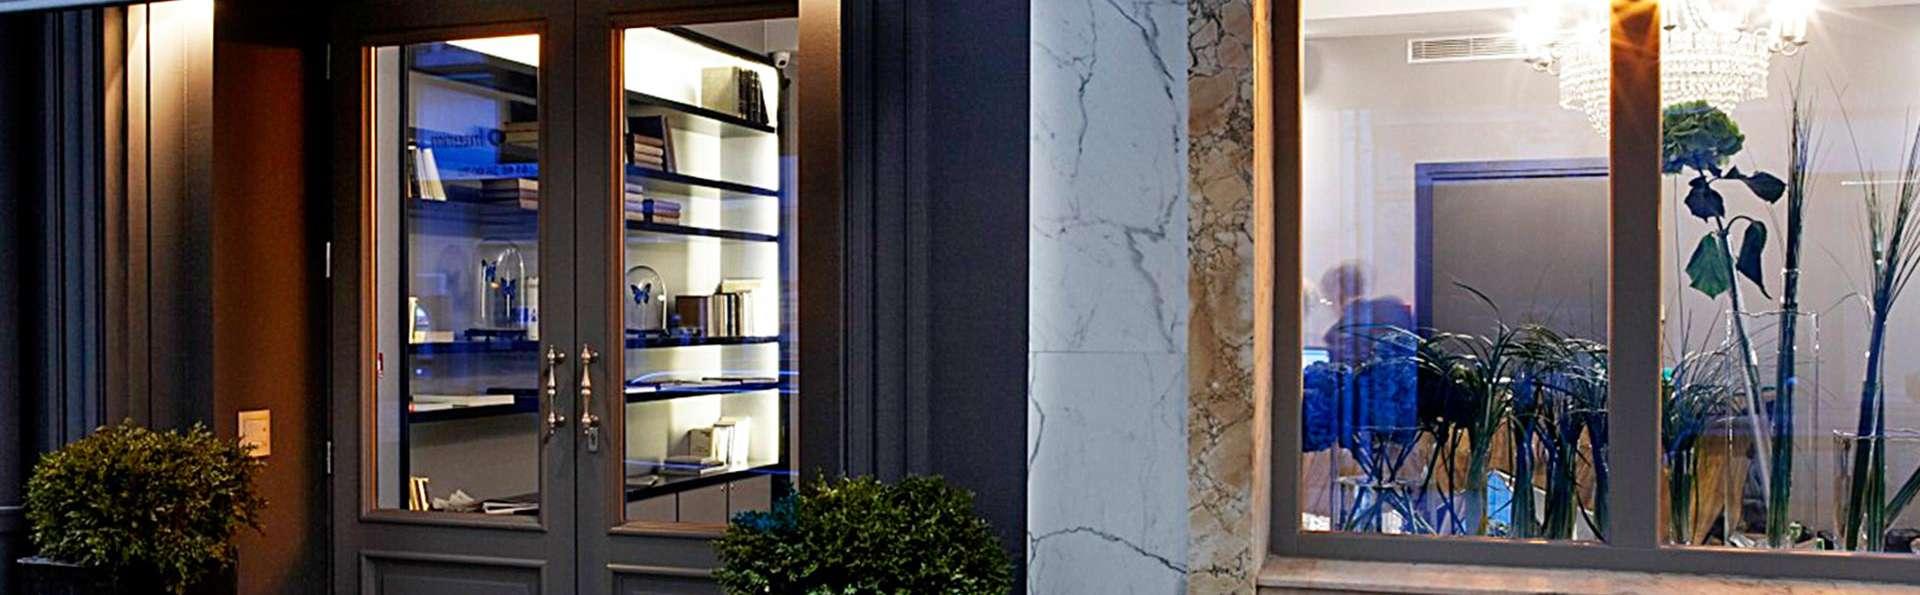 Hôtel Mademoiselle - edit_entrance.jpg